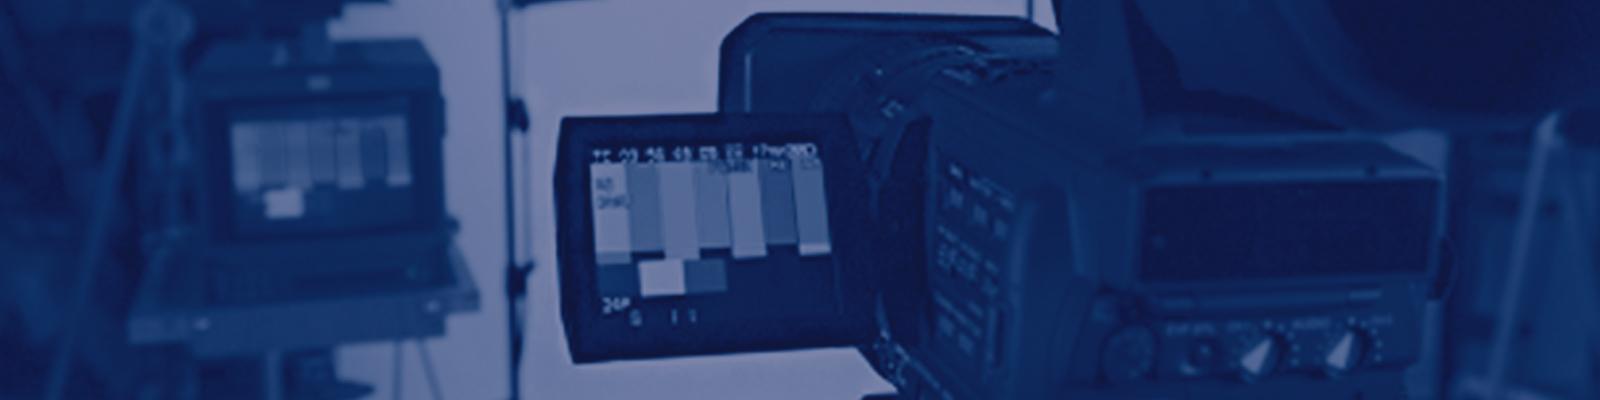 Fundo-produção-audiovisual1